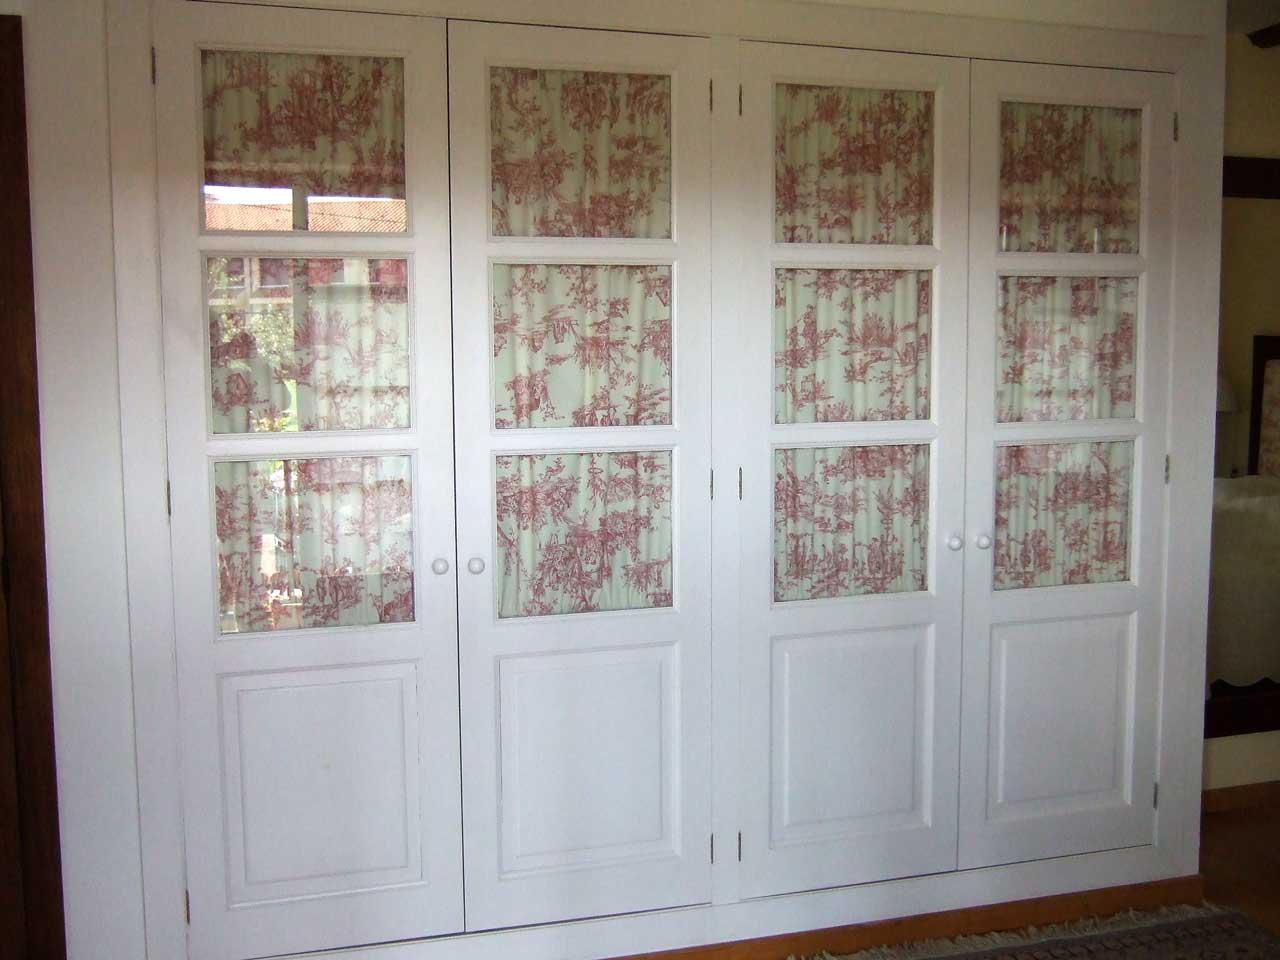 Pracicable con vitrina laca blanca